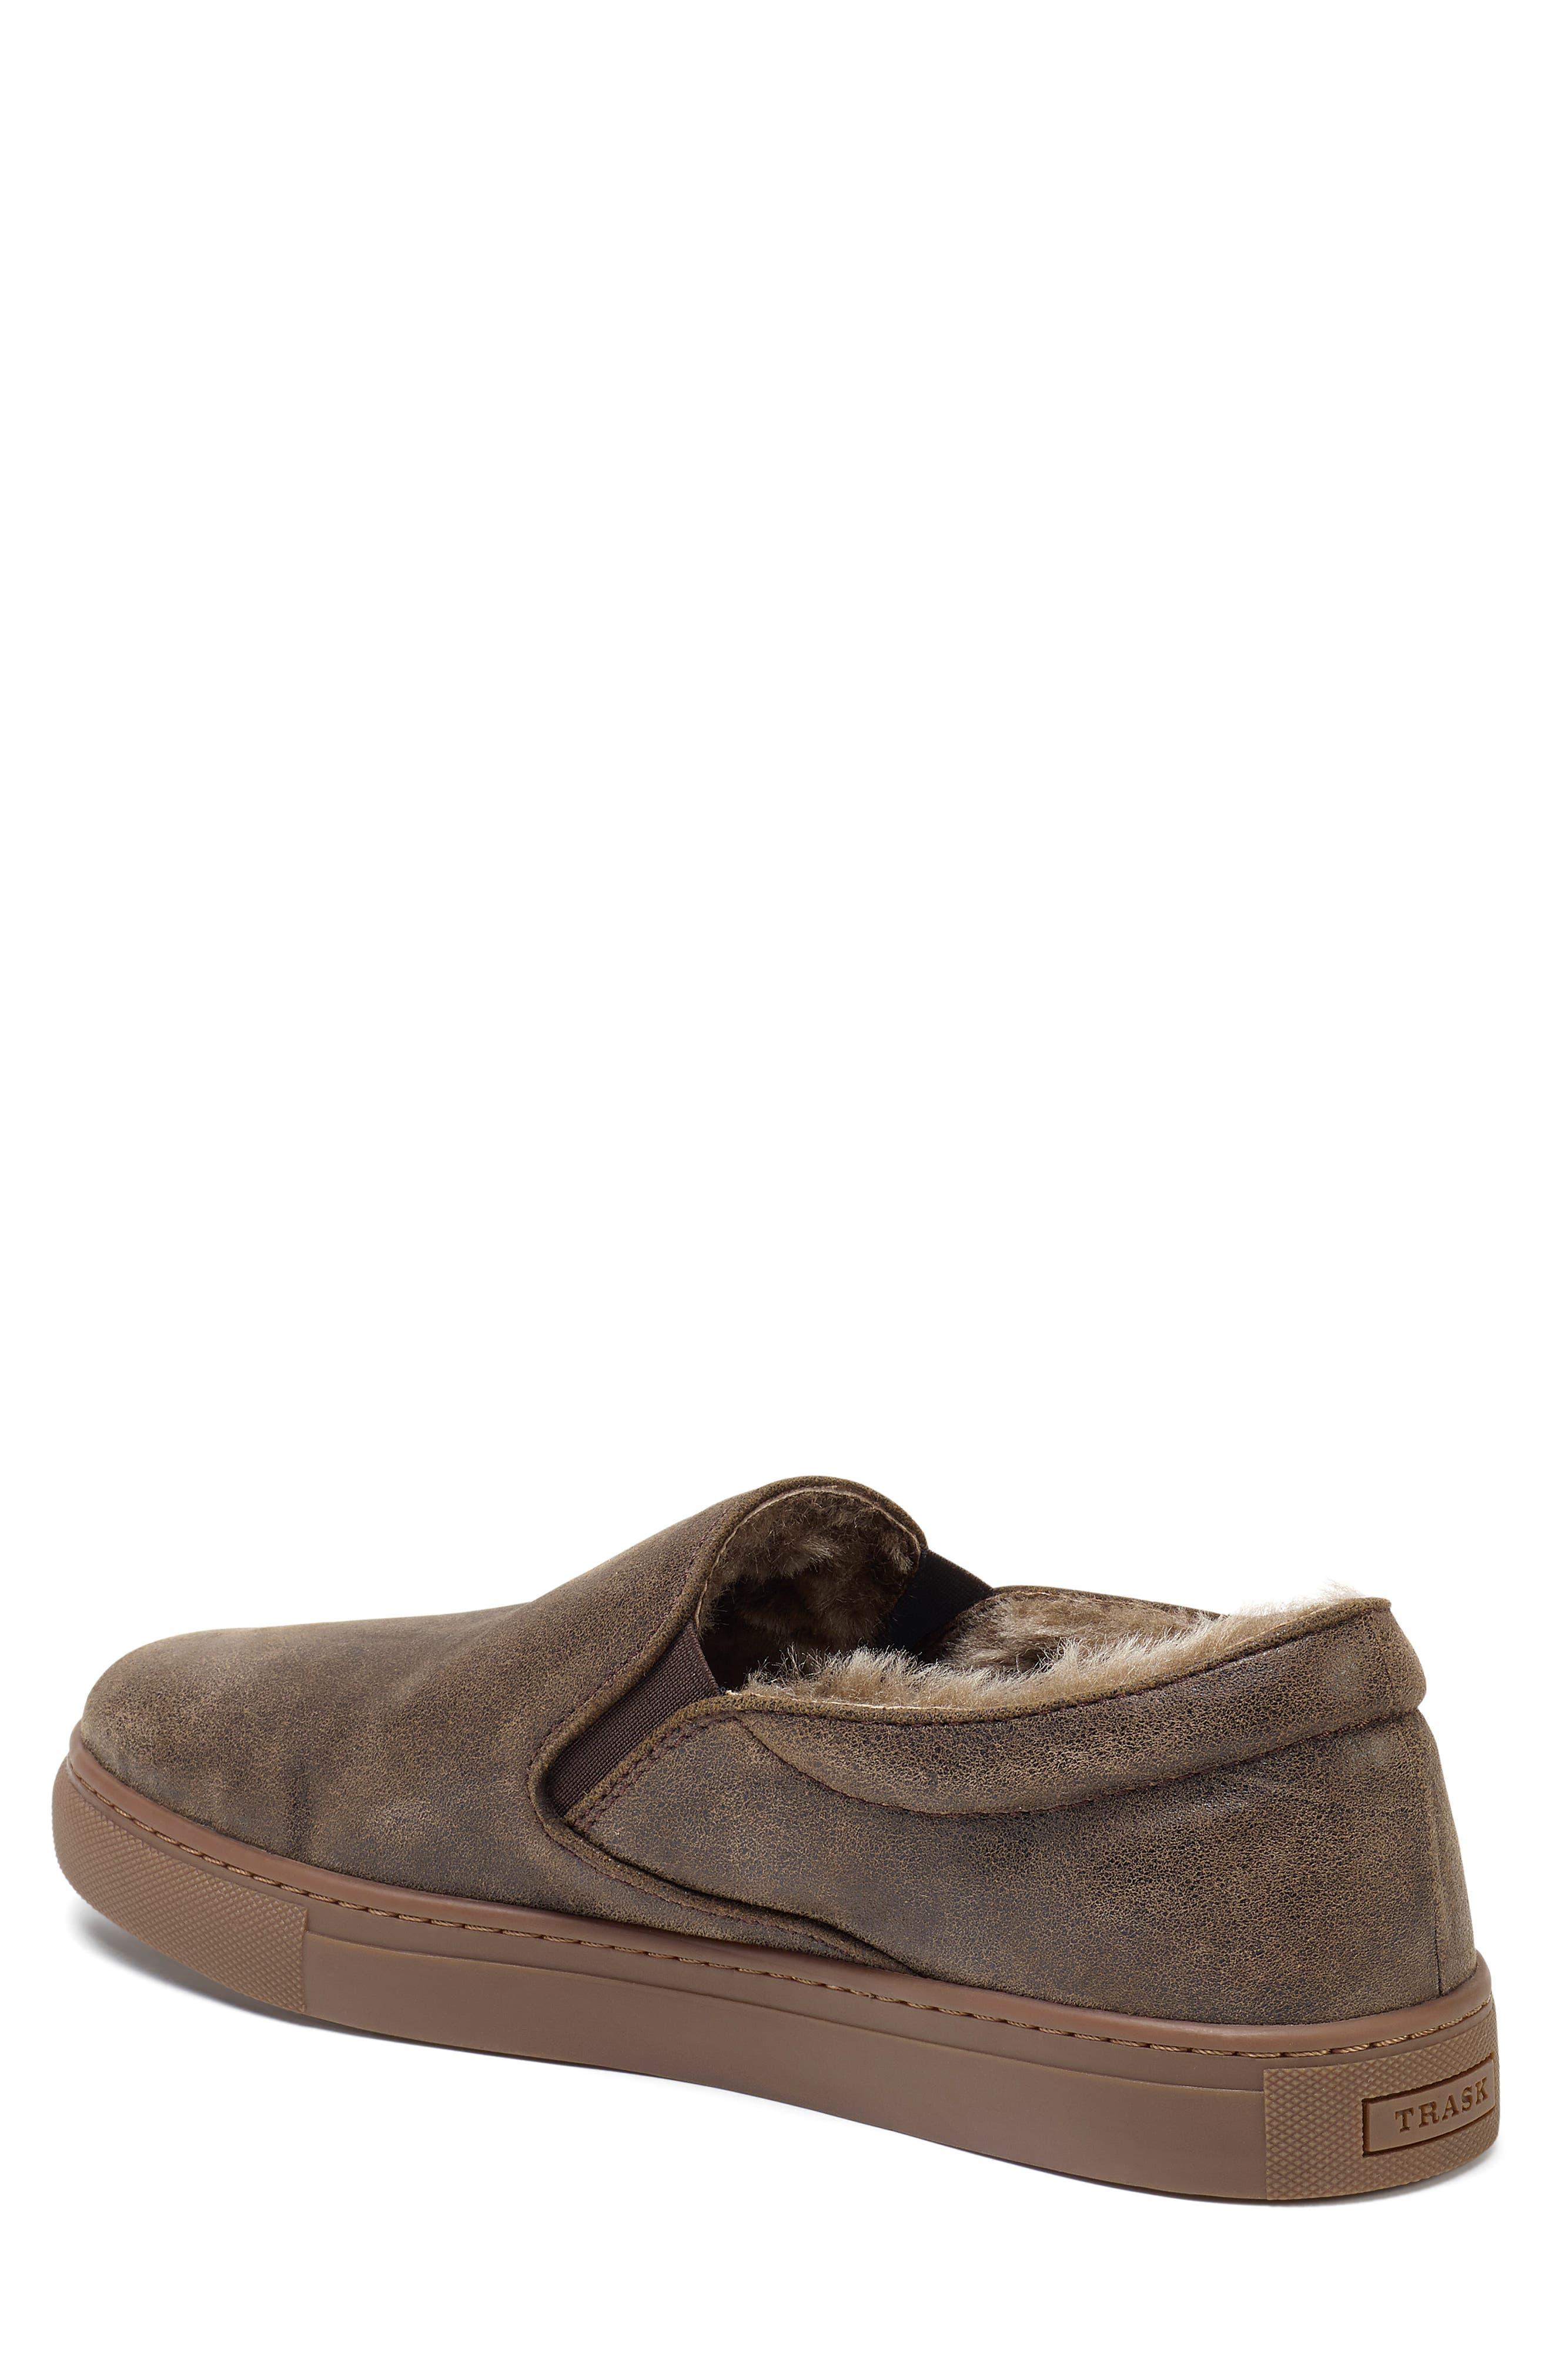 Alex Genuine Shearling Slip-On Sneaker,                             Alternate thumbnail 2, color,                             BROWN SUEDE